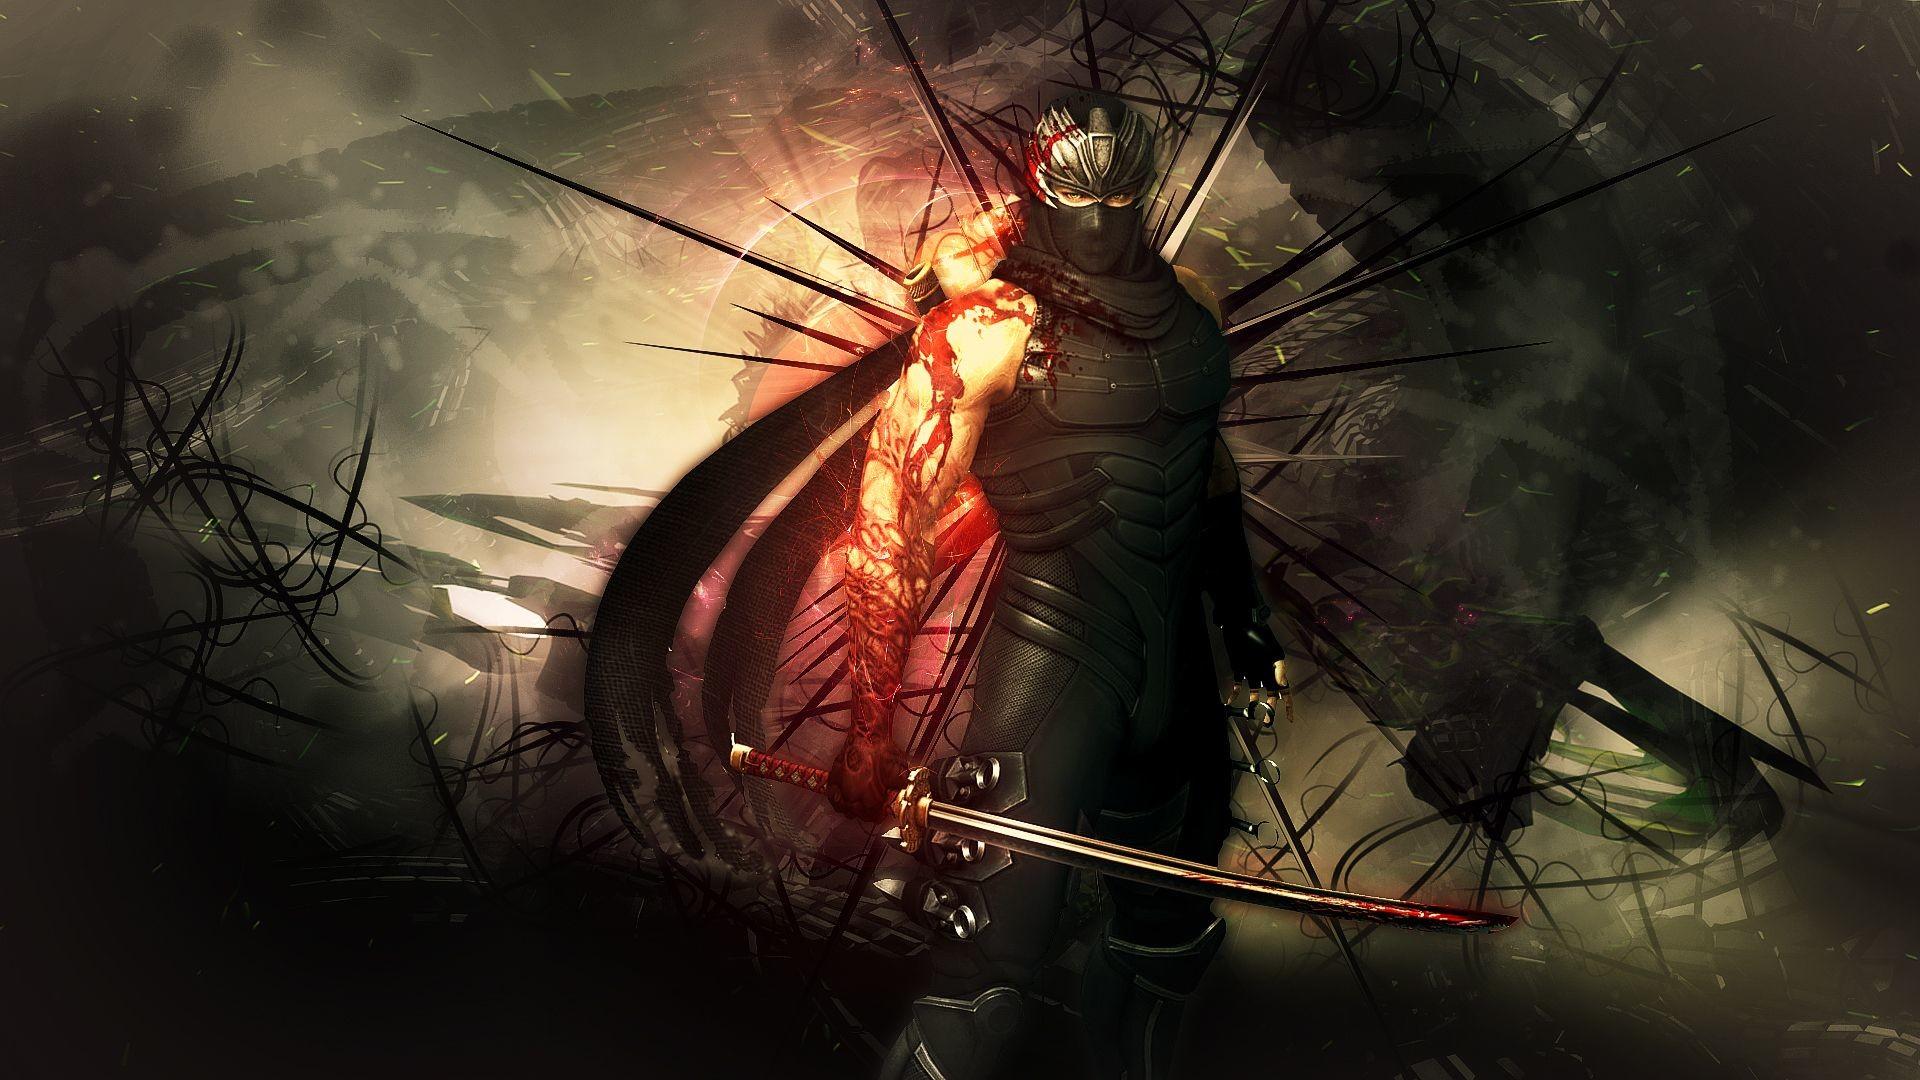 NINJA GAIDEN fantasy anime warrior weapon sword blood f wallpaper .